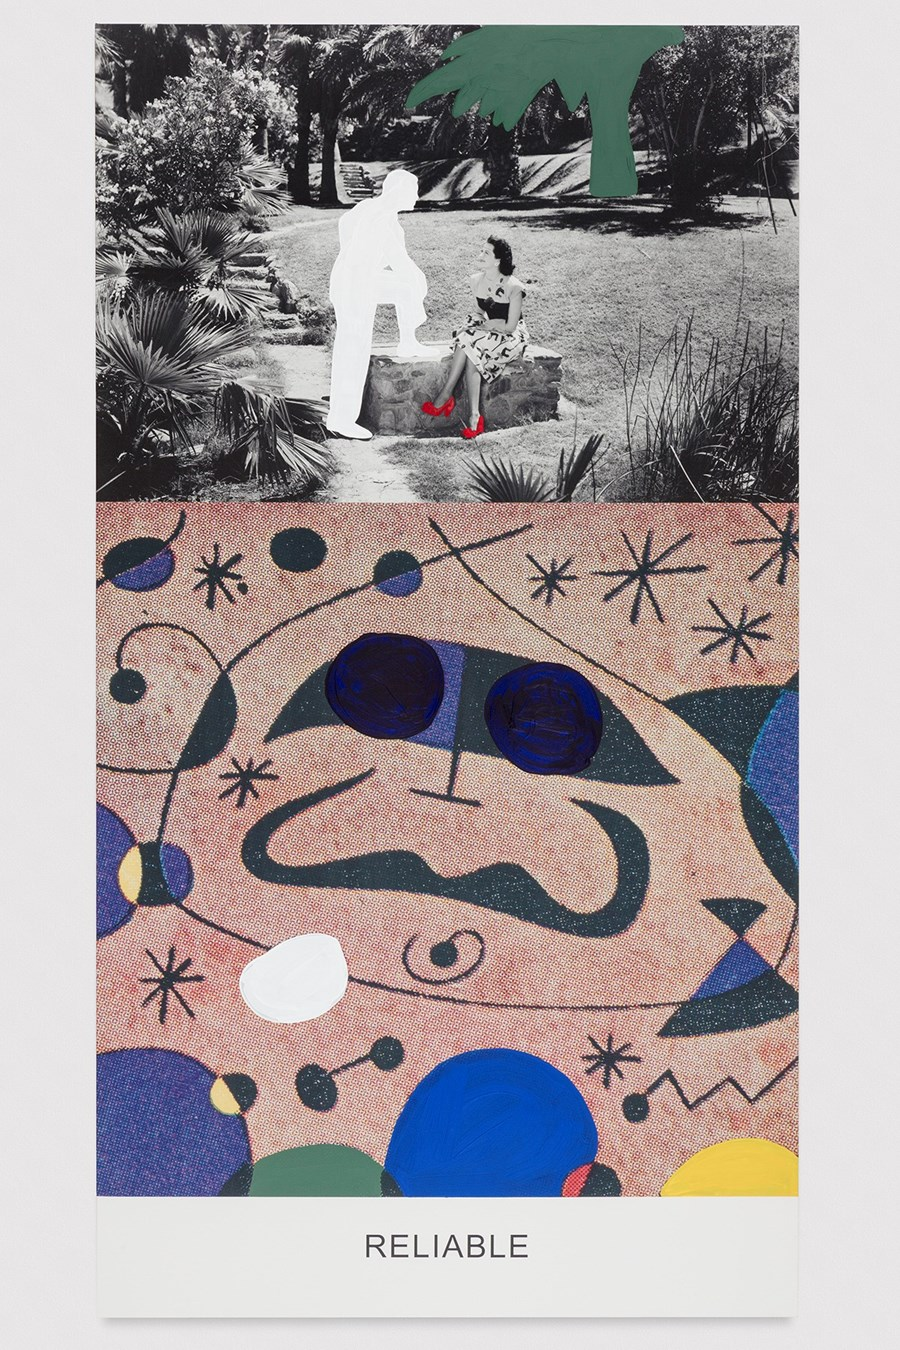 'Reliable', 'Necessary', Copyright John Baldessari, courtesy the artist and Marian Goodman Gallery